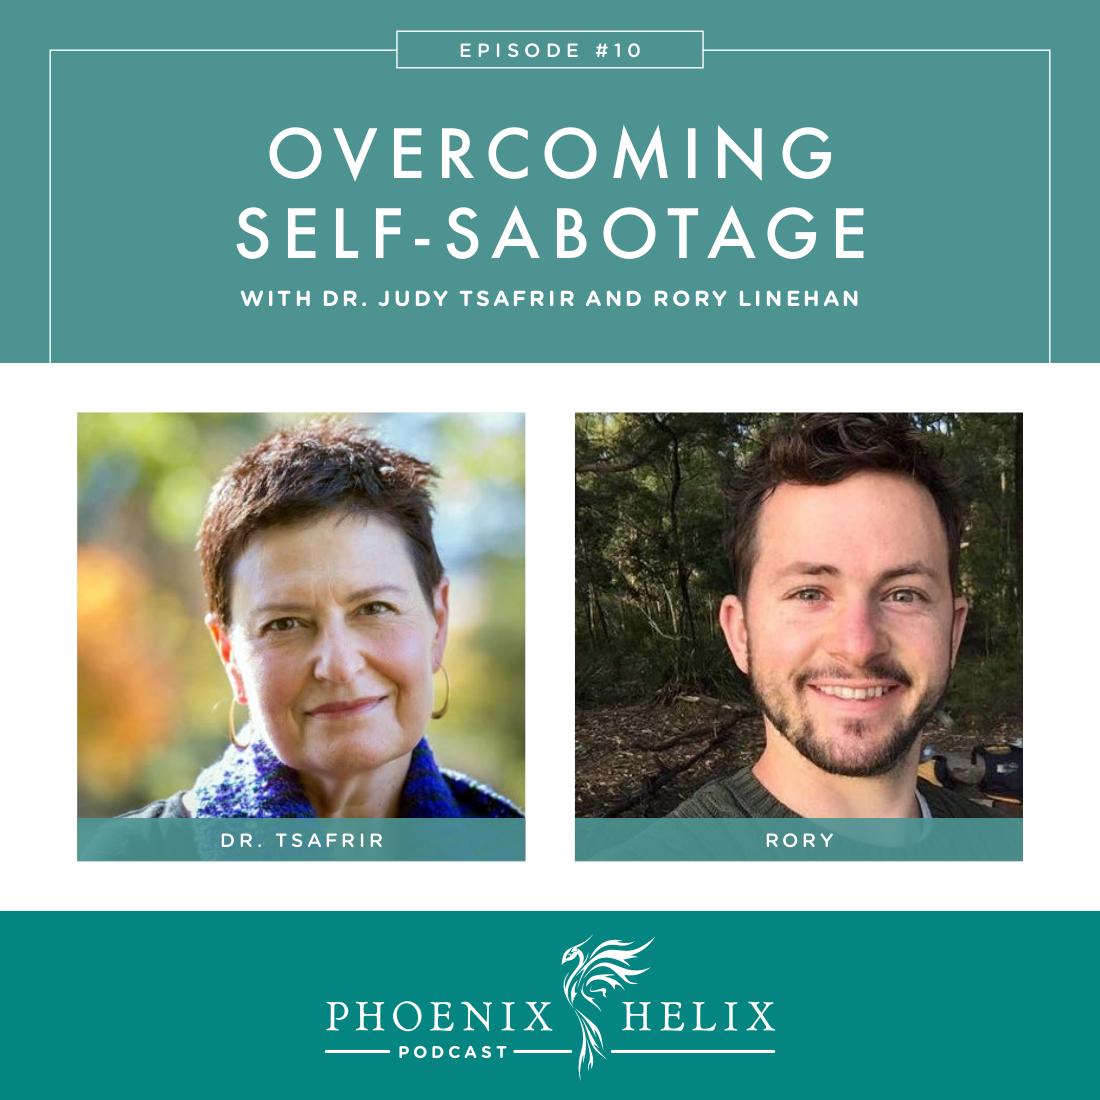 Overcoming Self-Sabotage | Phoenix Helix Podcast